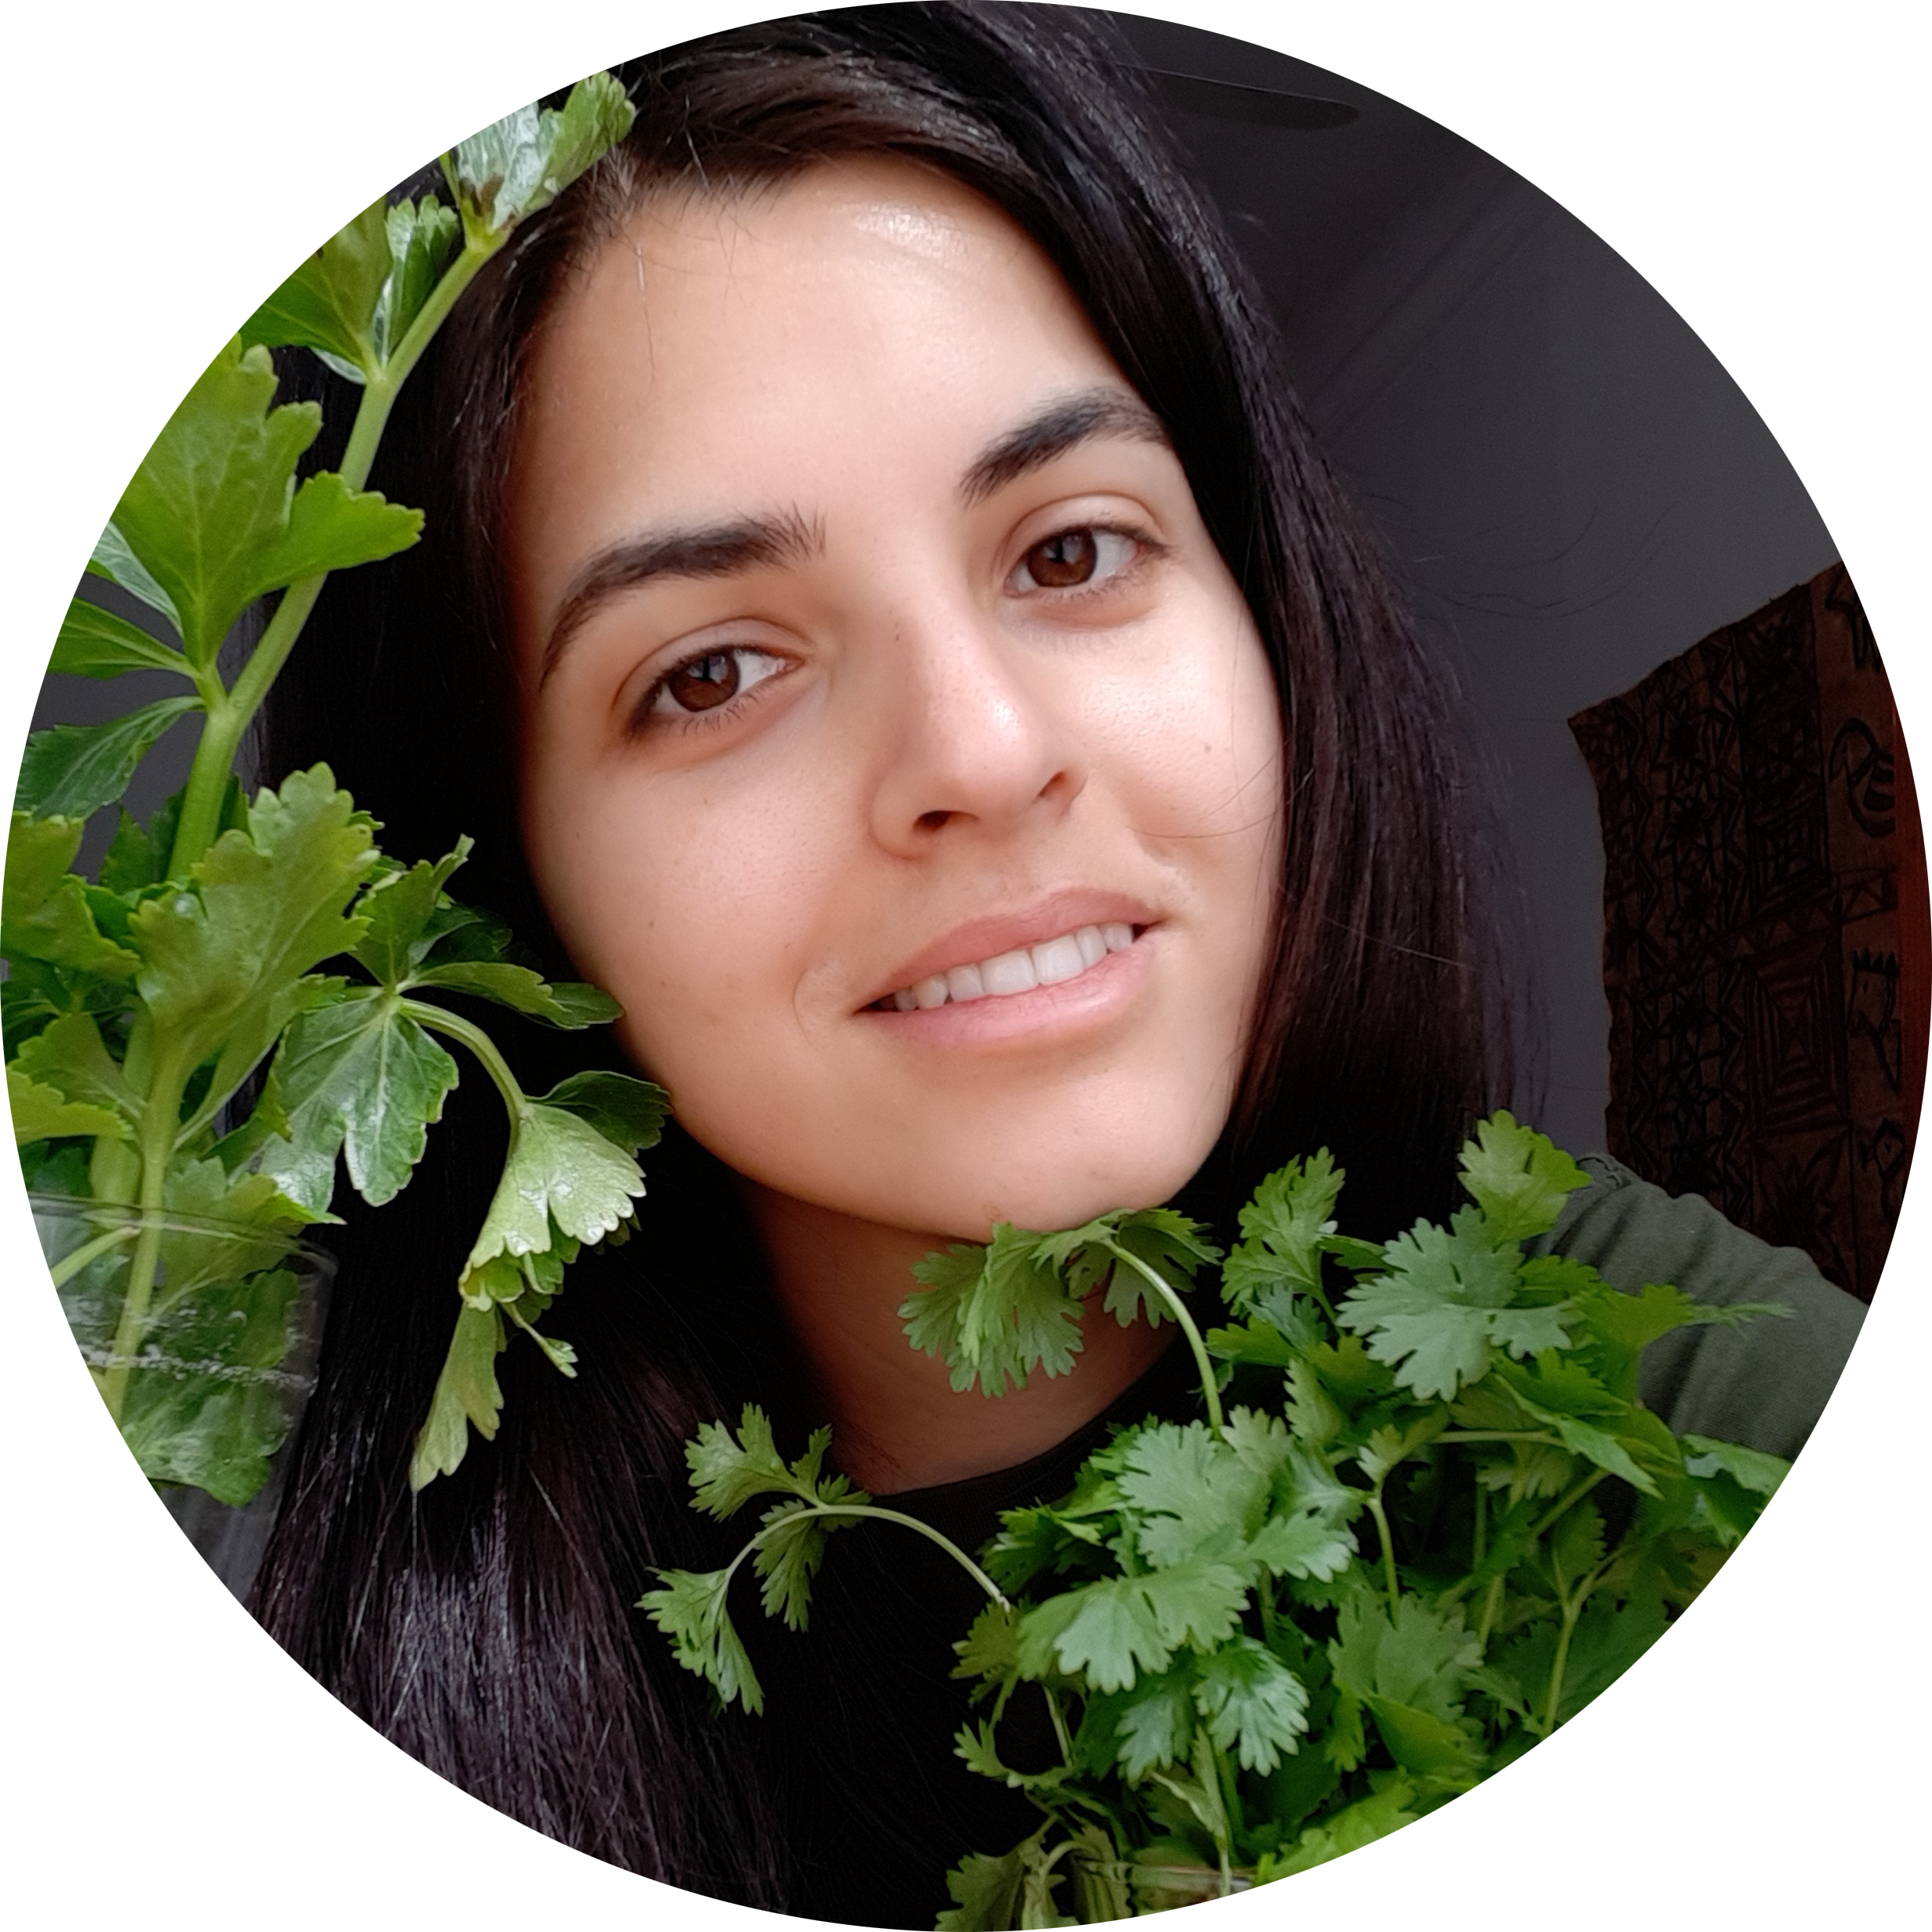 Marta's Plants